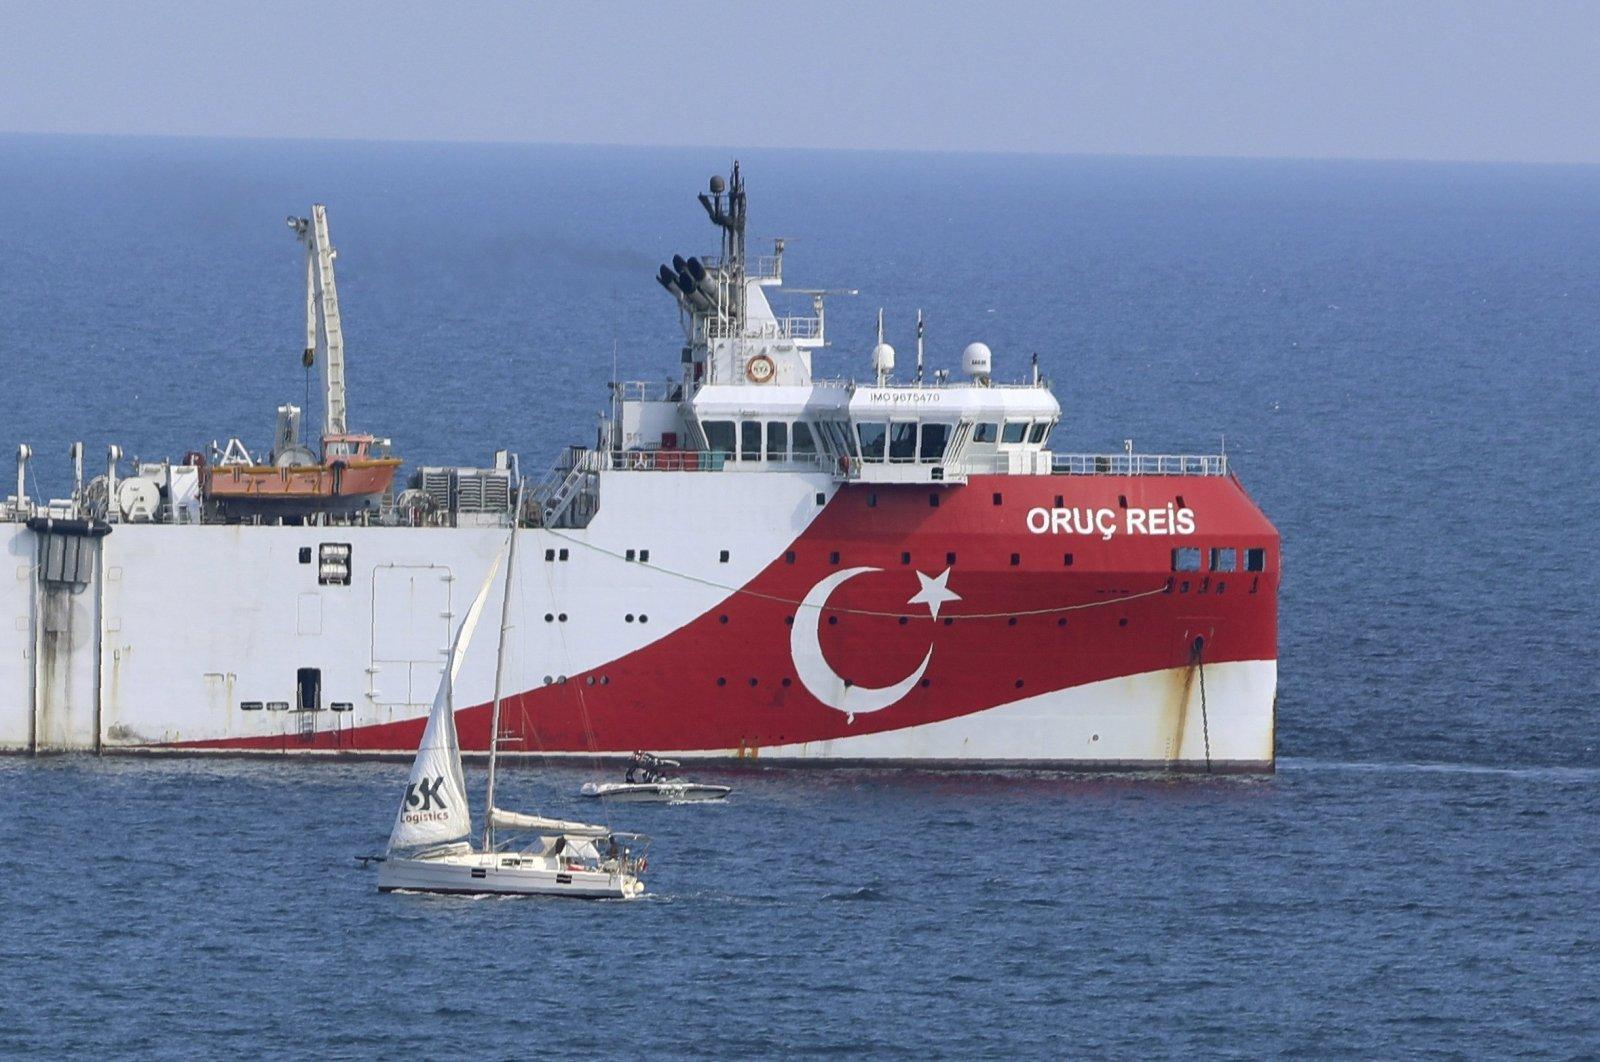 Turkish seismic research vessel Oruç Reis sails in the Bosporus in Istanbul, Turkey, Oct. 3, 2018. (Reuters File Photo)